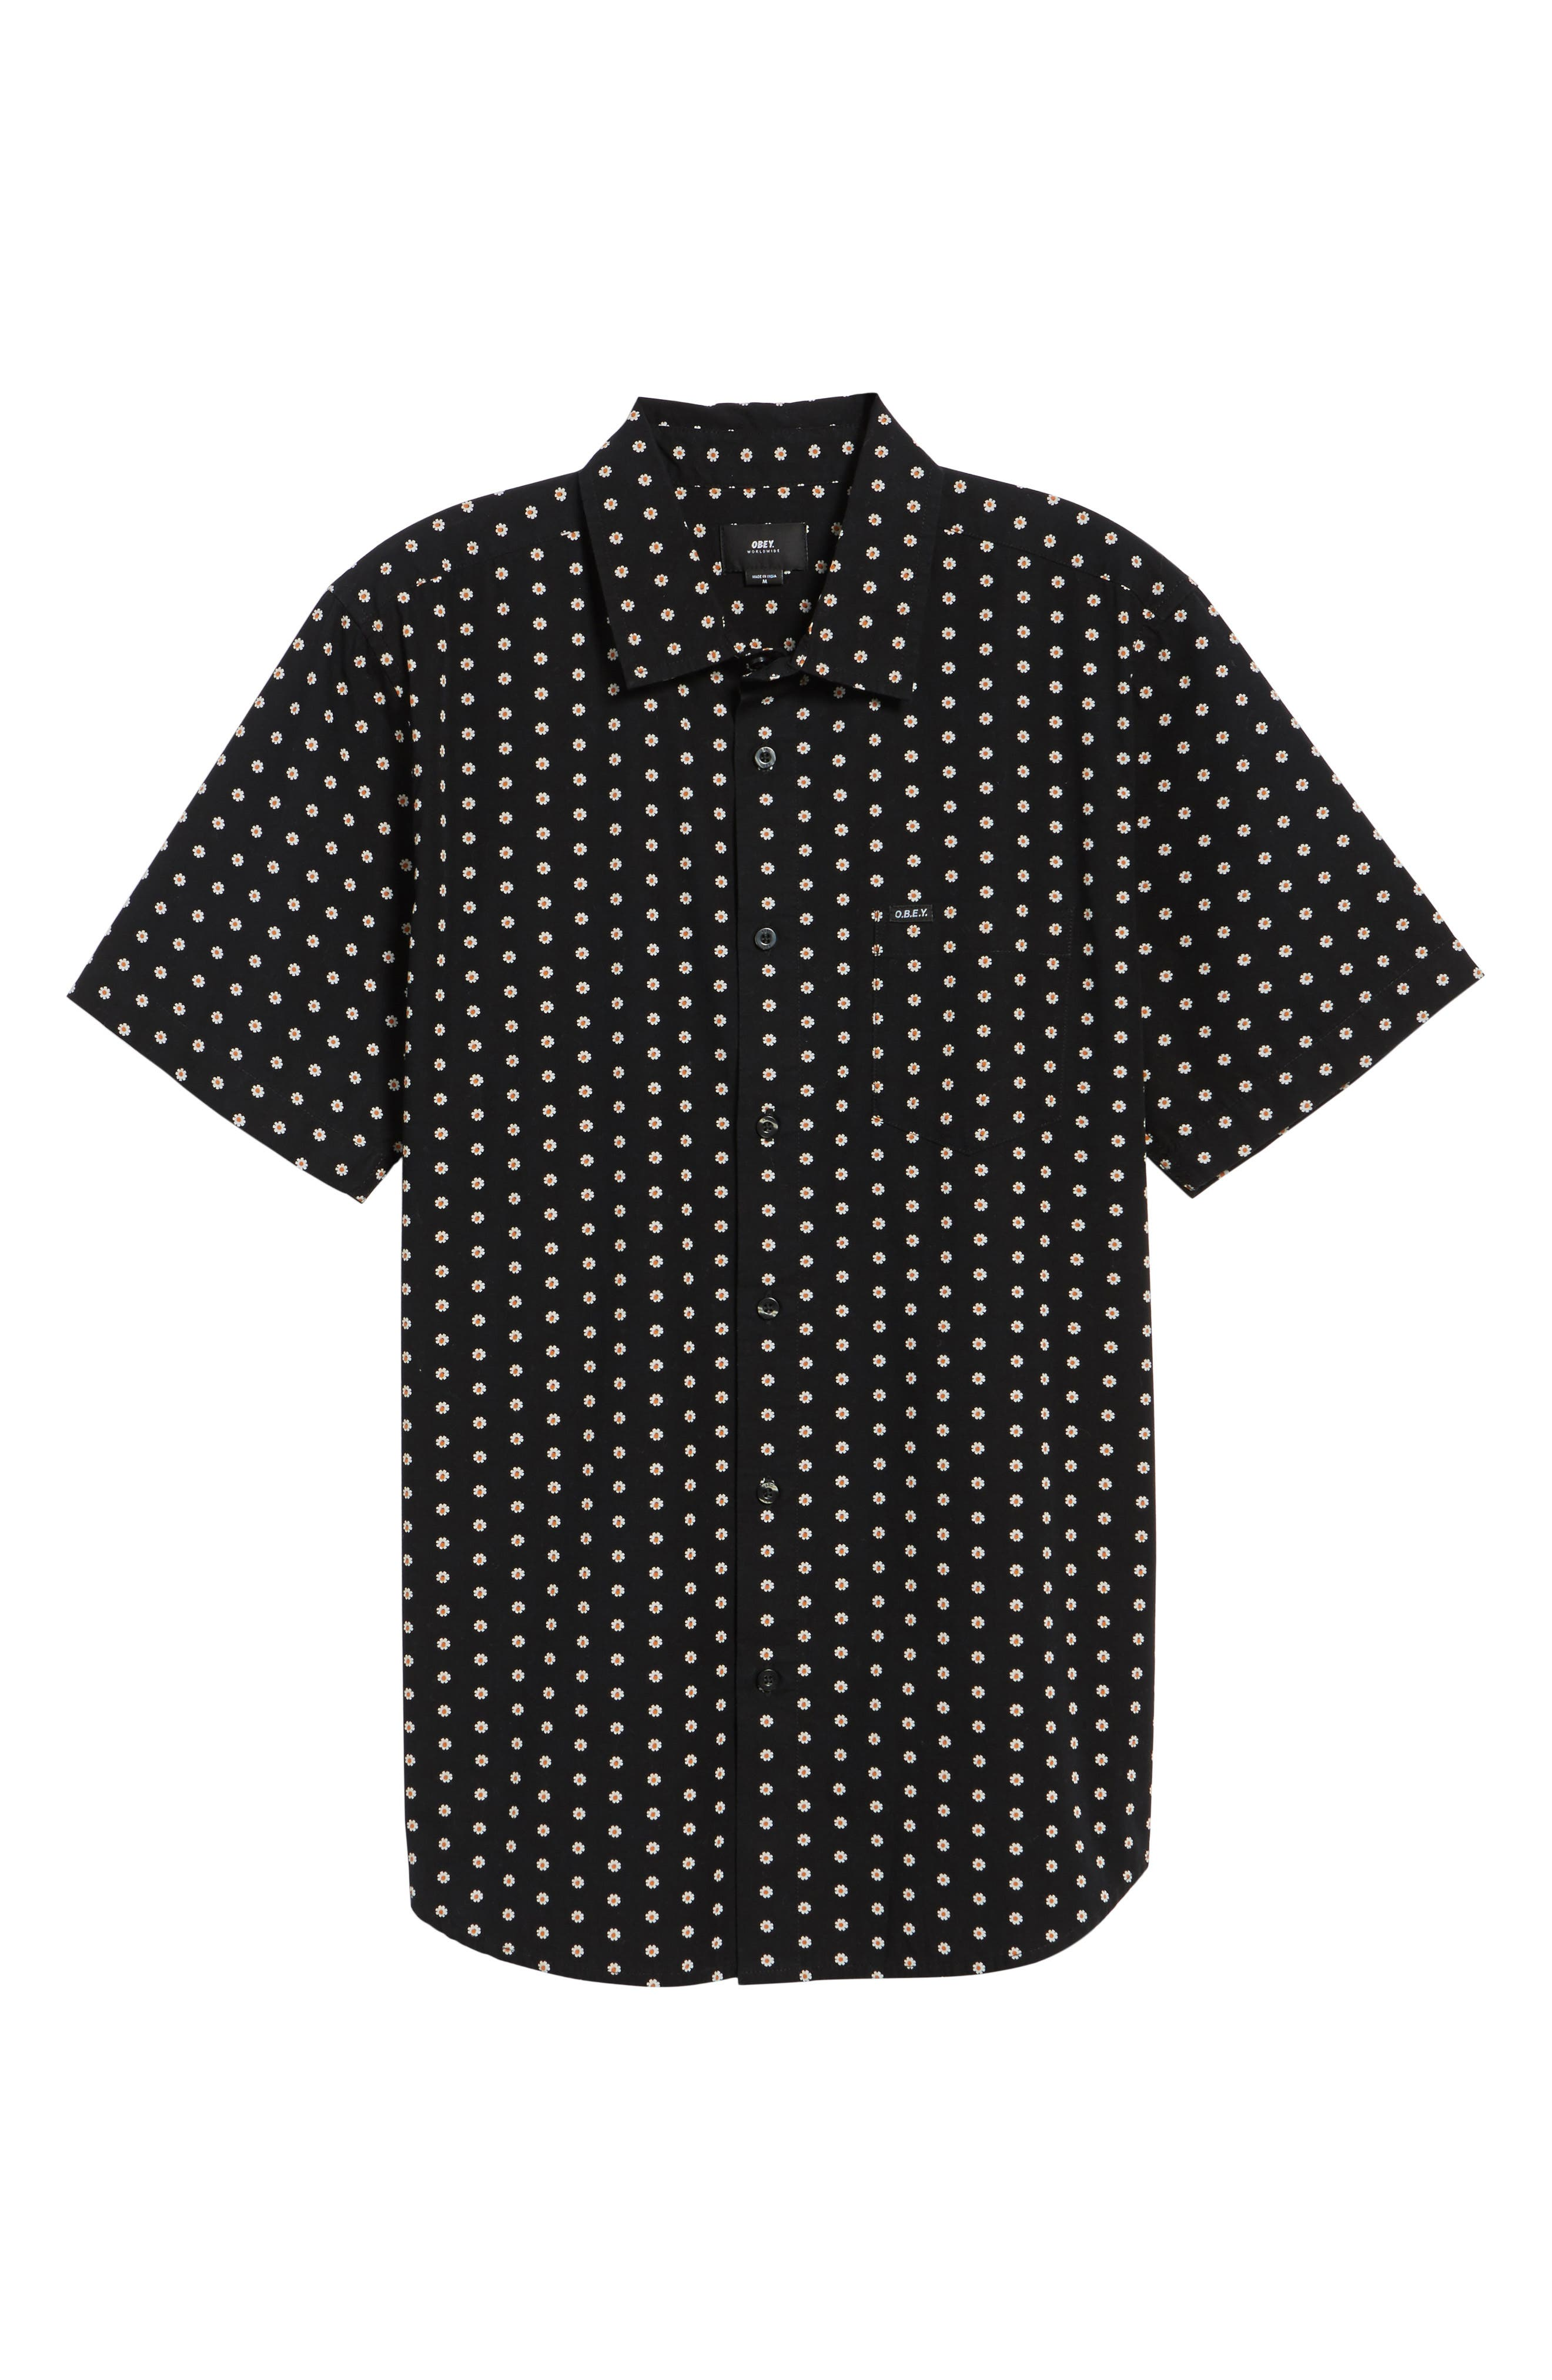 Brighton Short Sleeve Shirt,                             Alternate thumbnail 6, color,                             002